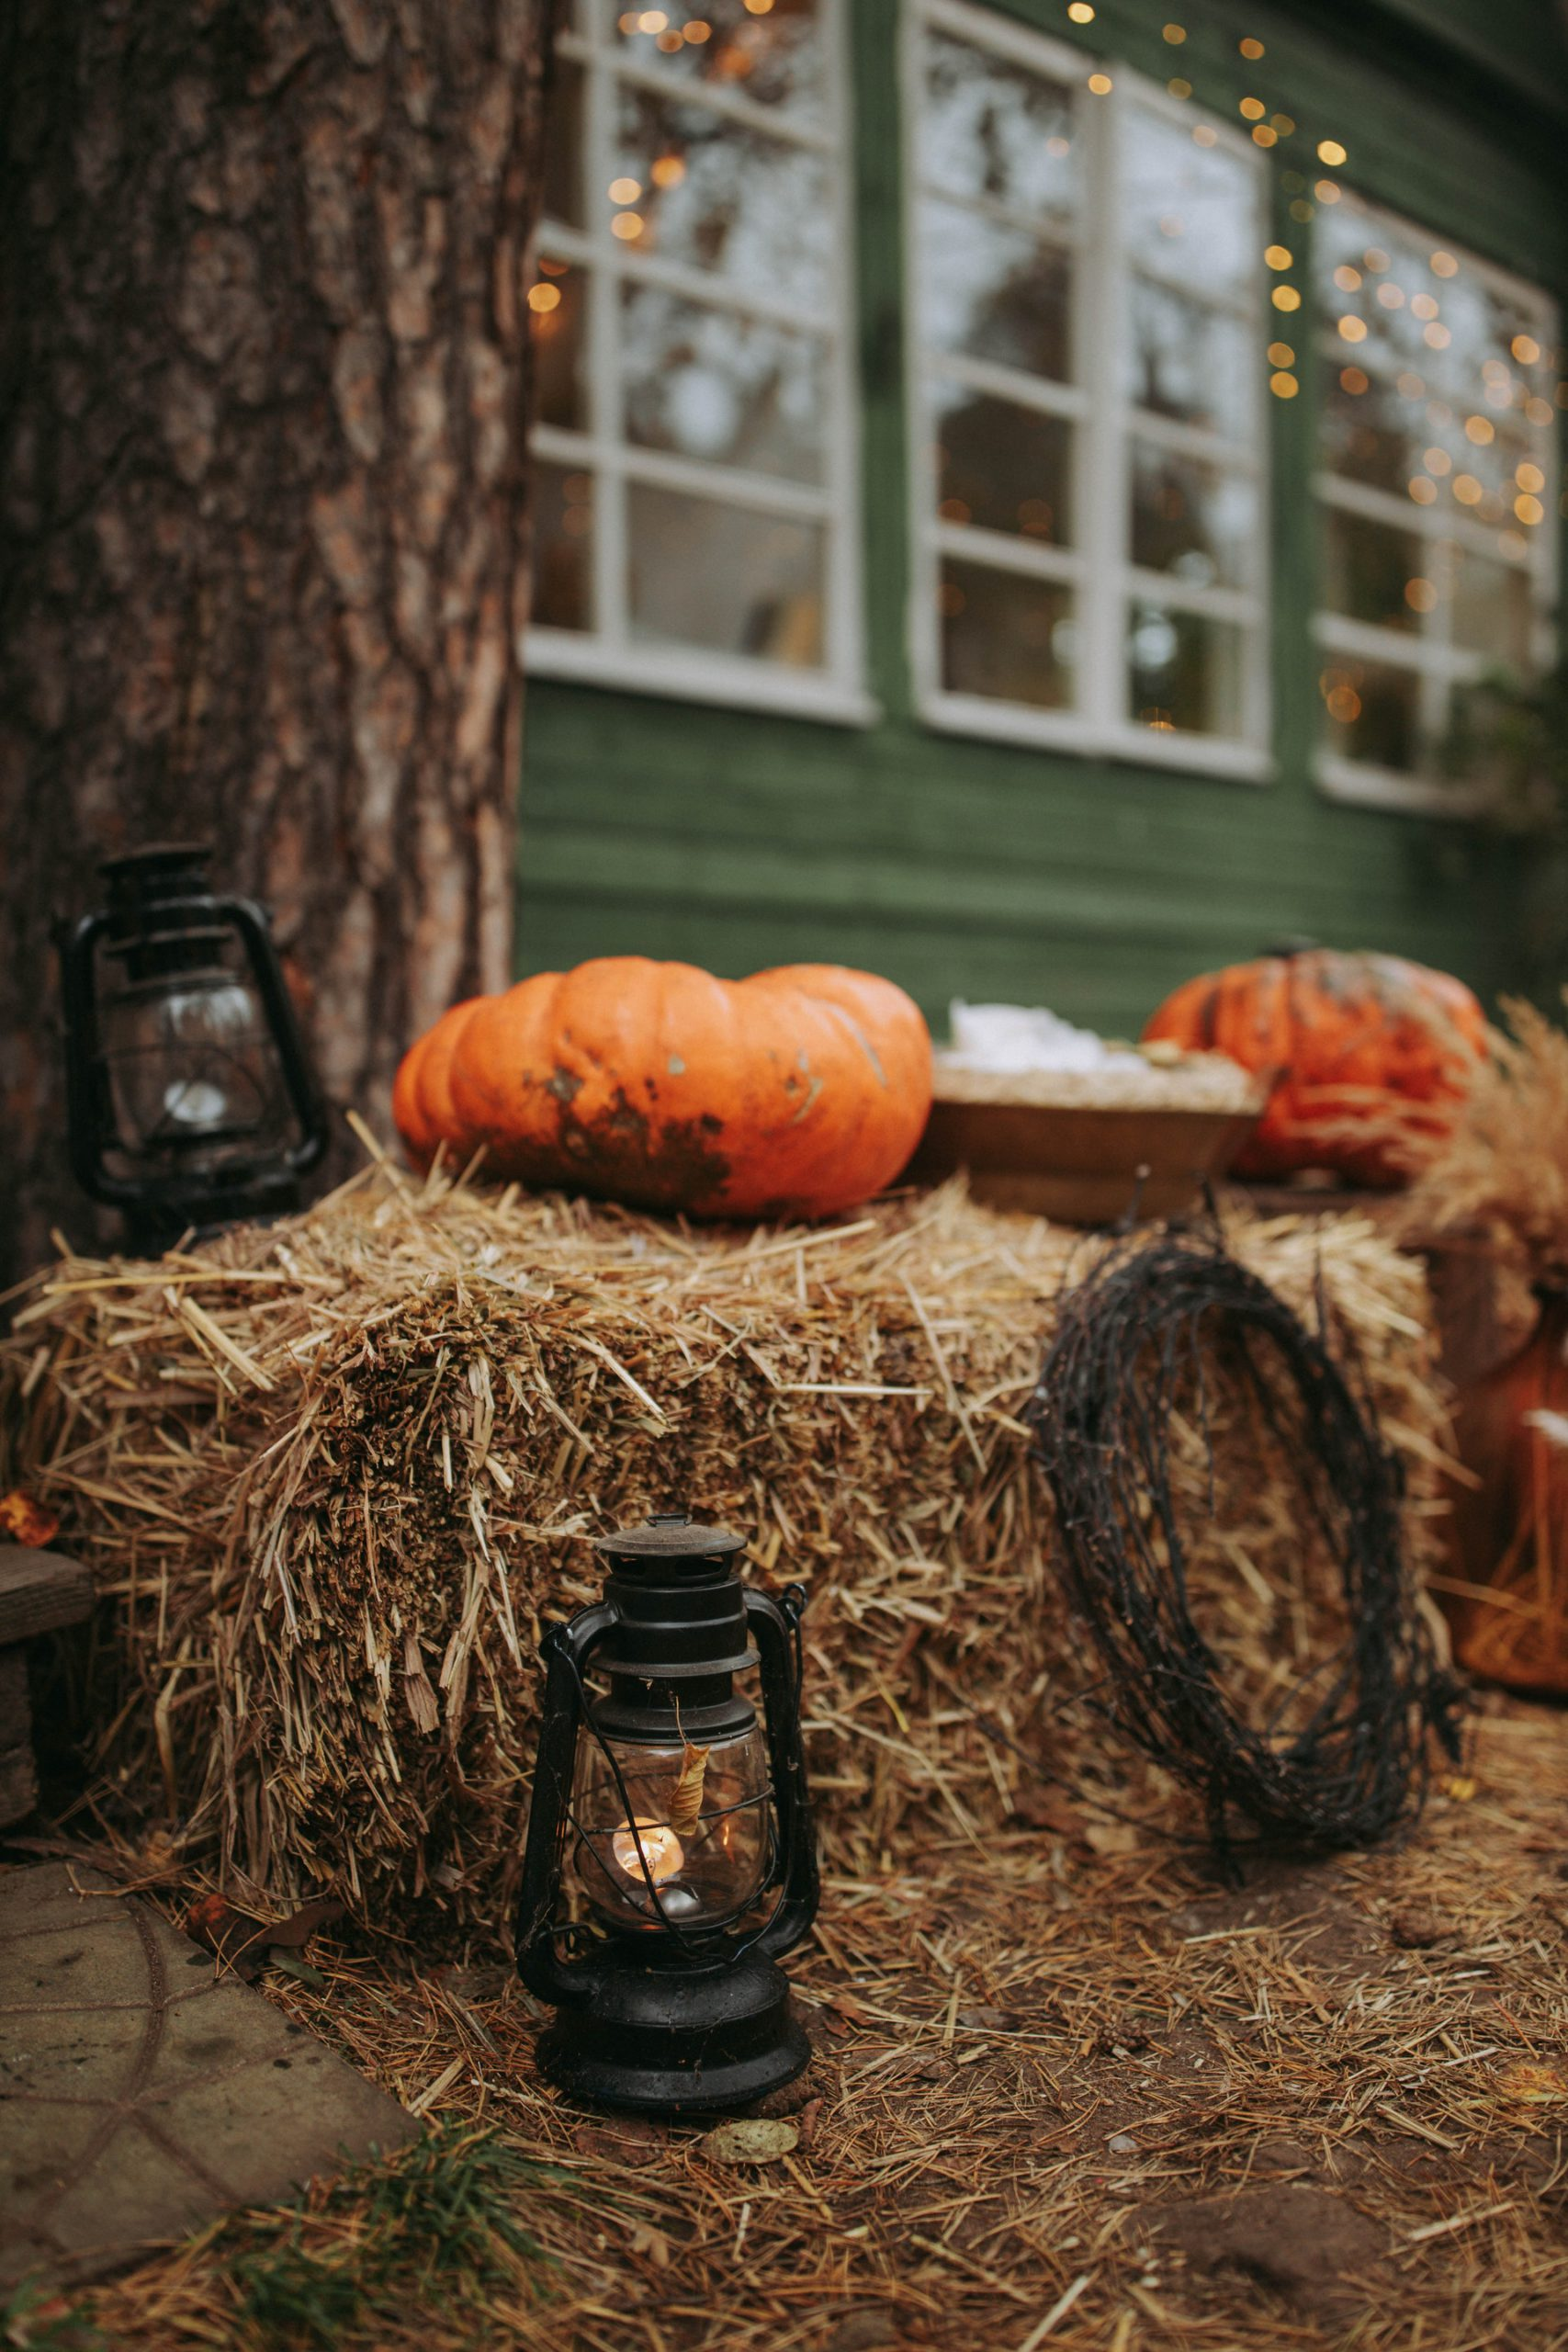 Photo of Pumpkins & Lanterns on Hay Bales